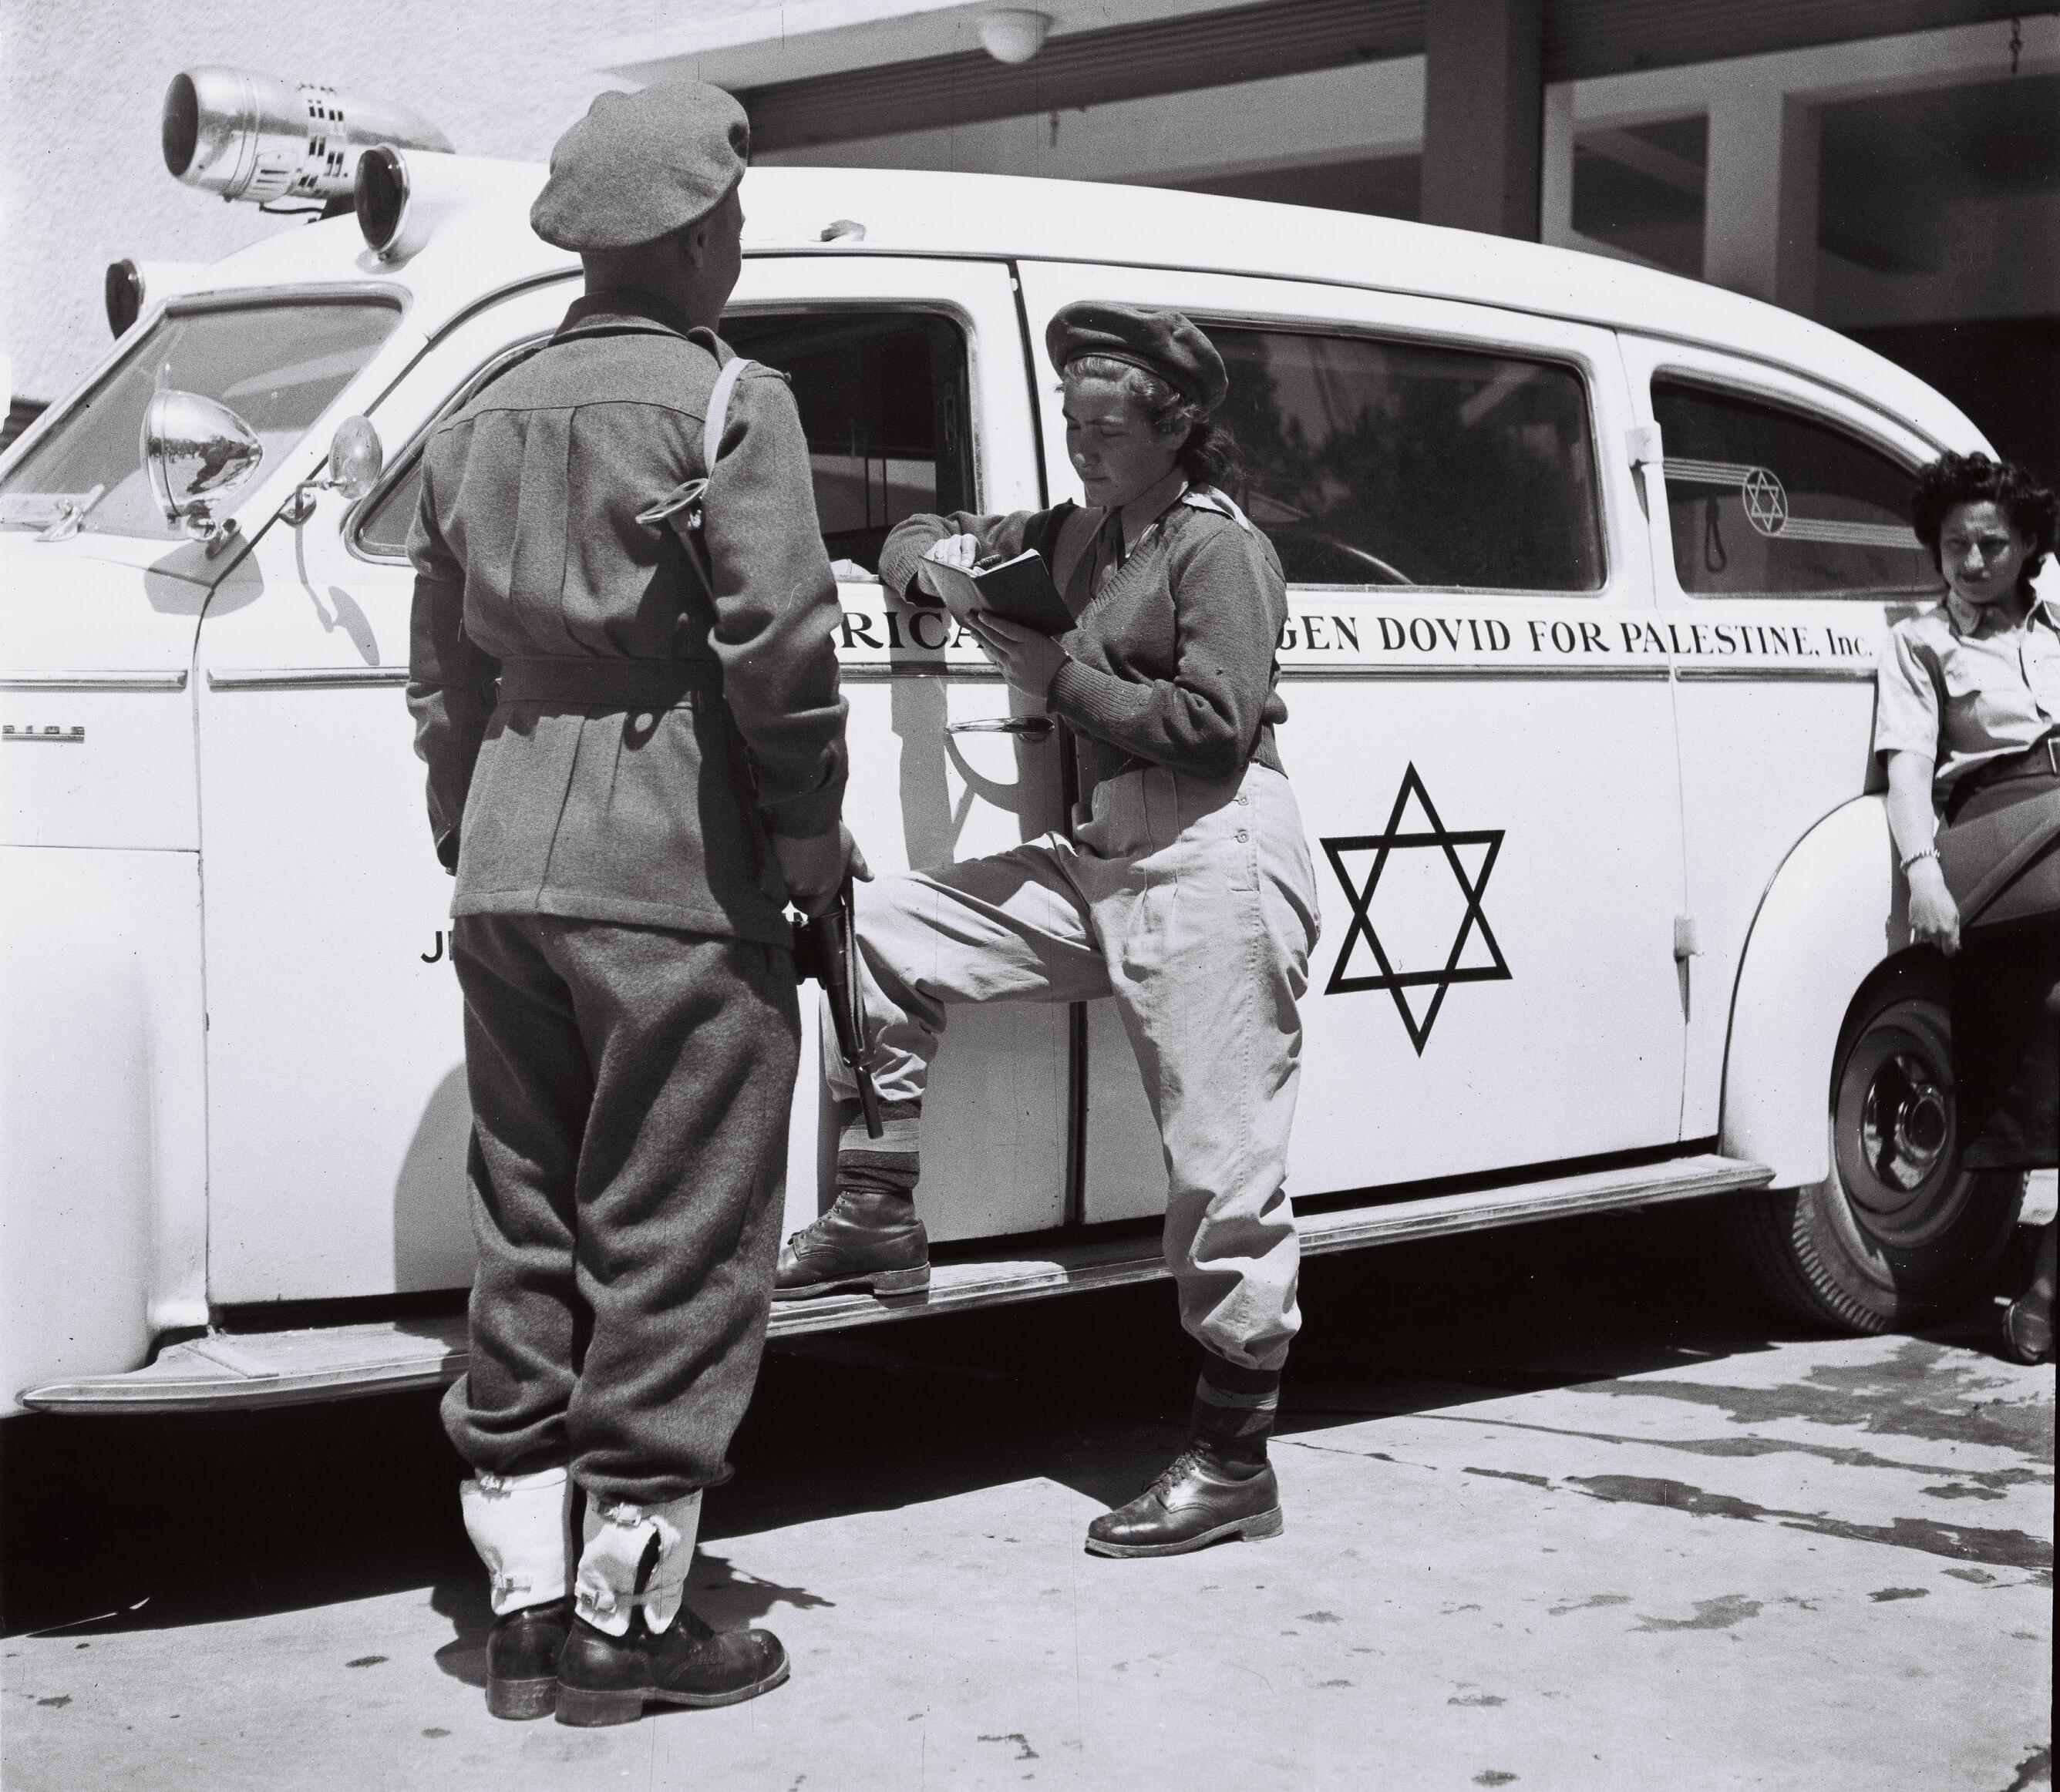 The Dodge Star And Jewish History: Magen David Adom